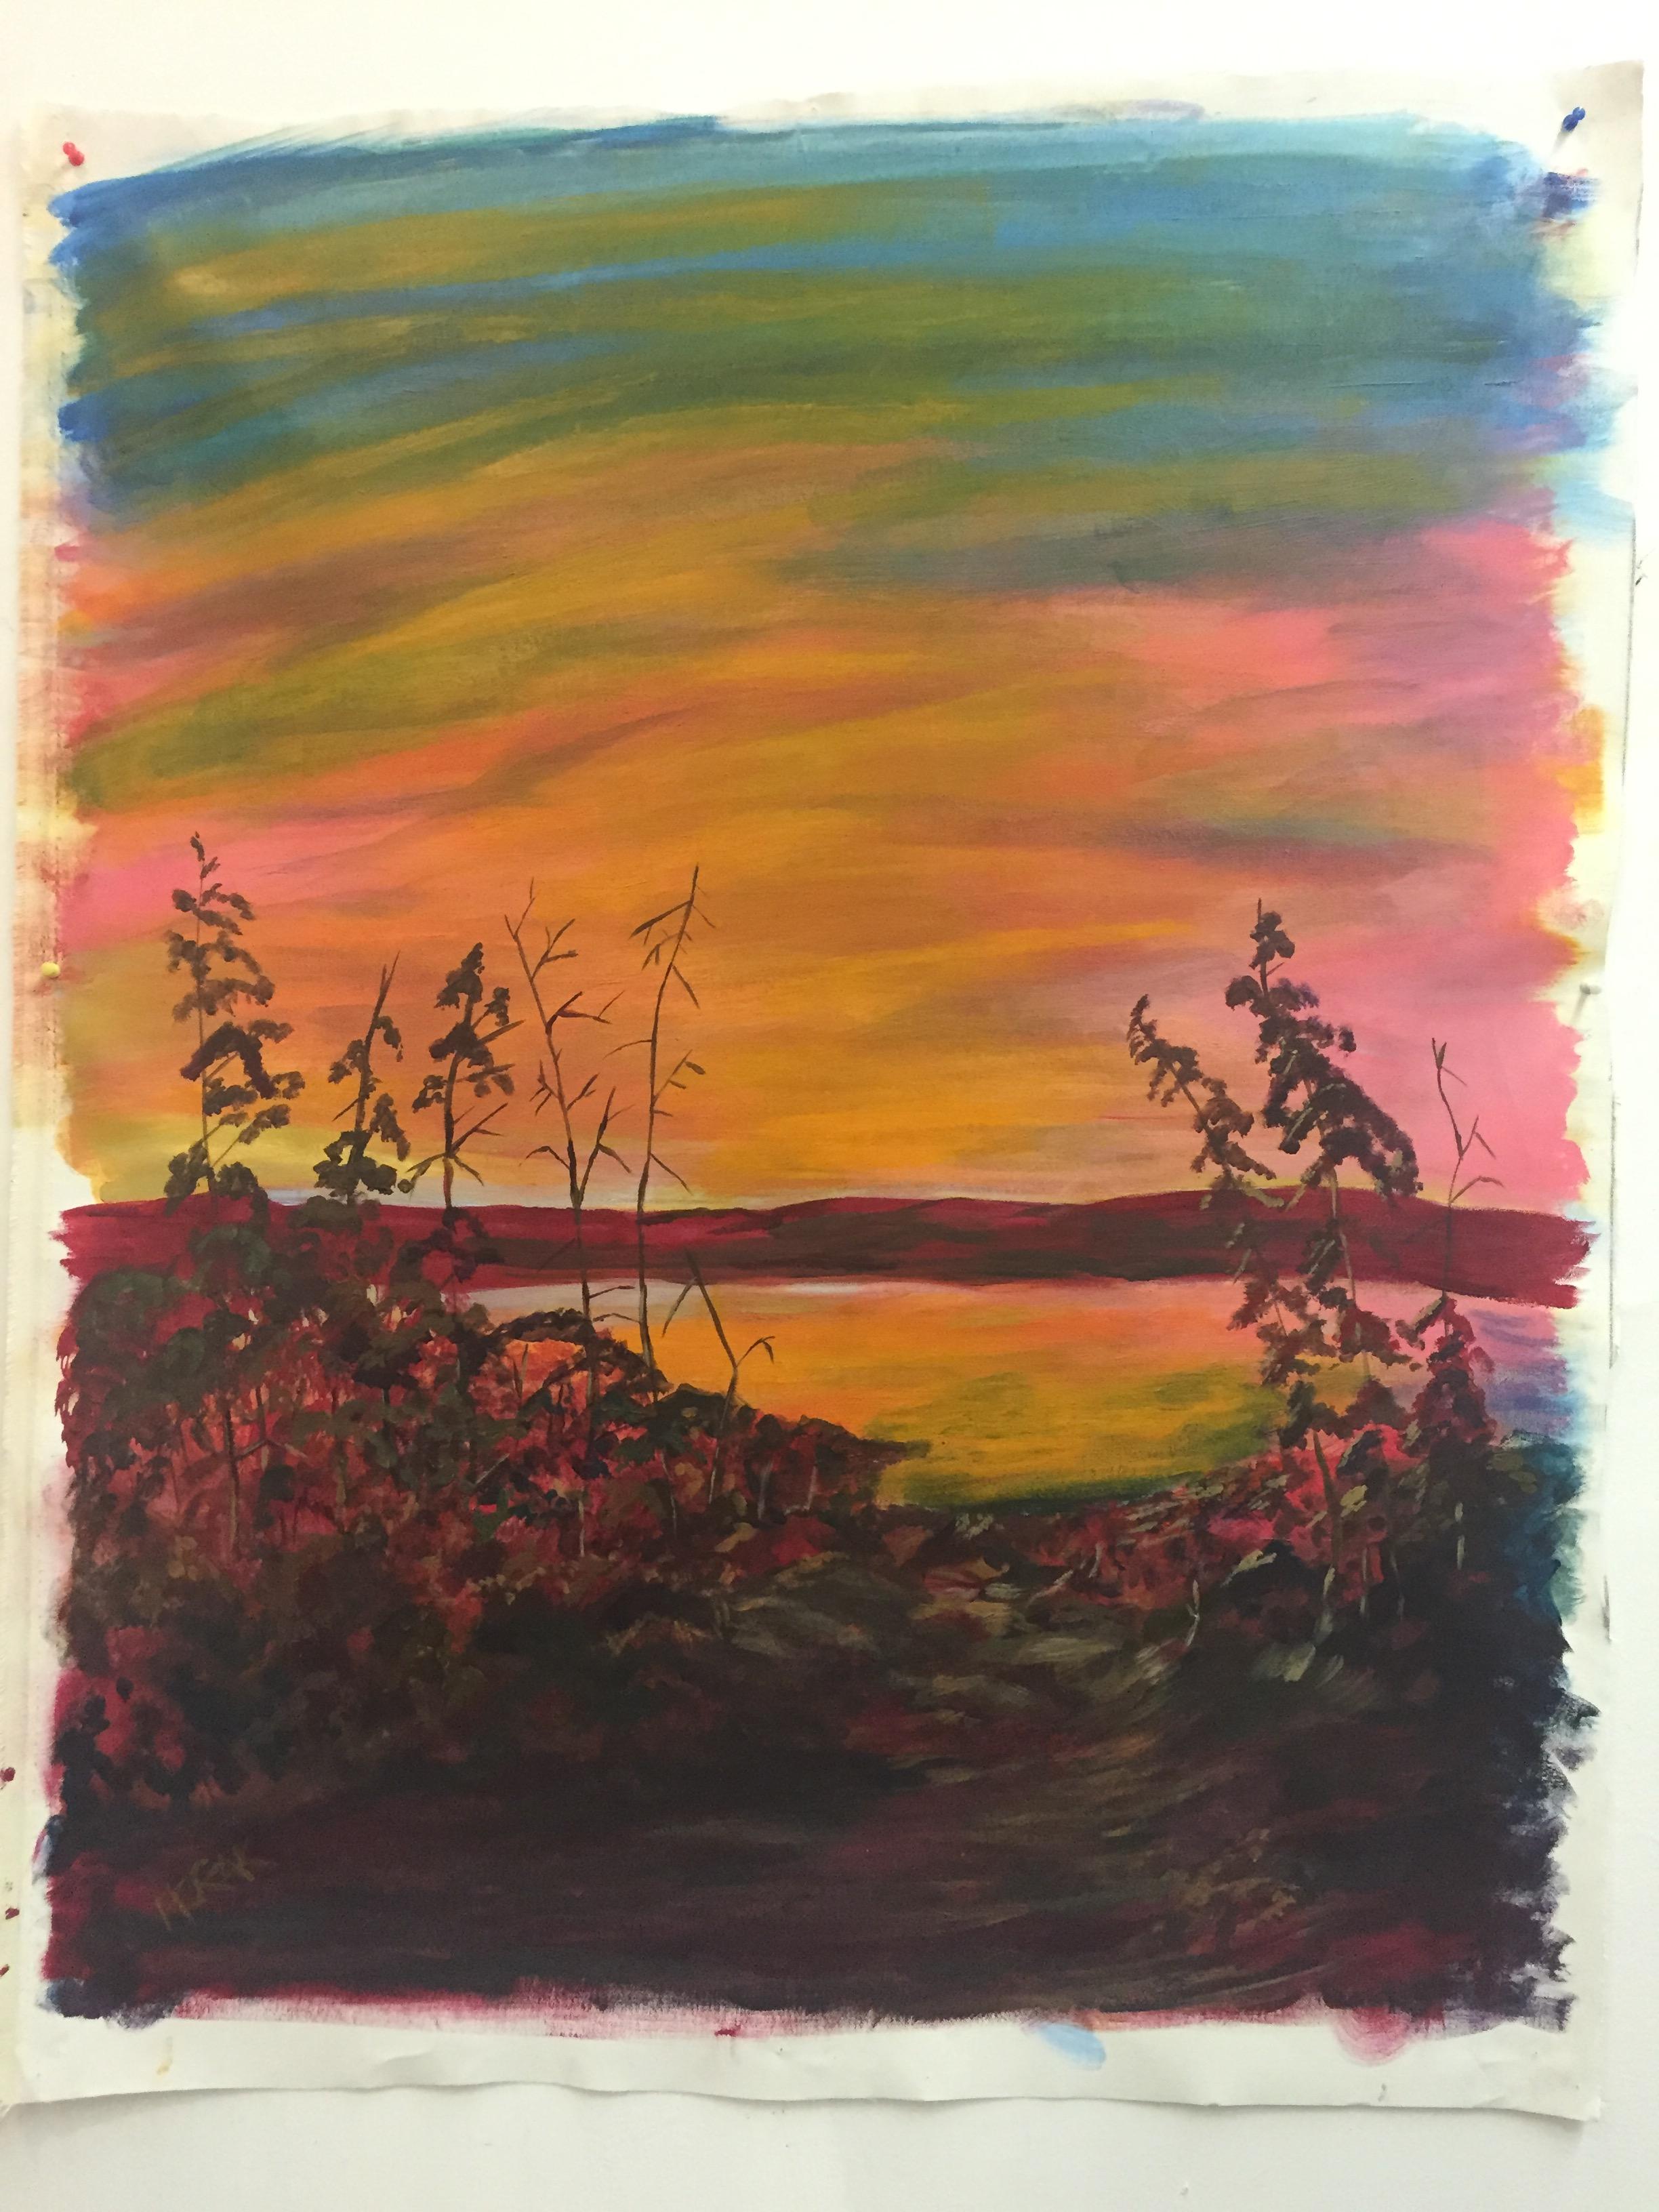 Sunset, P.E.I. - Acrylic on Canvass.  3'x5'